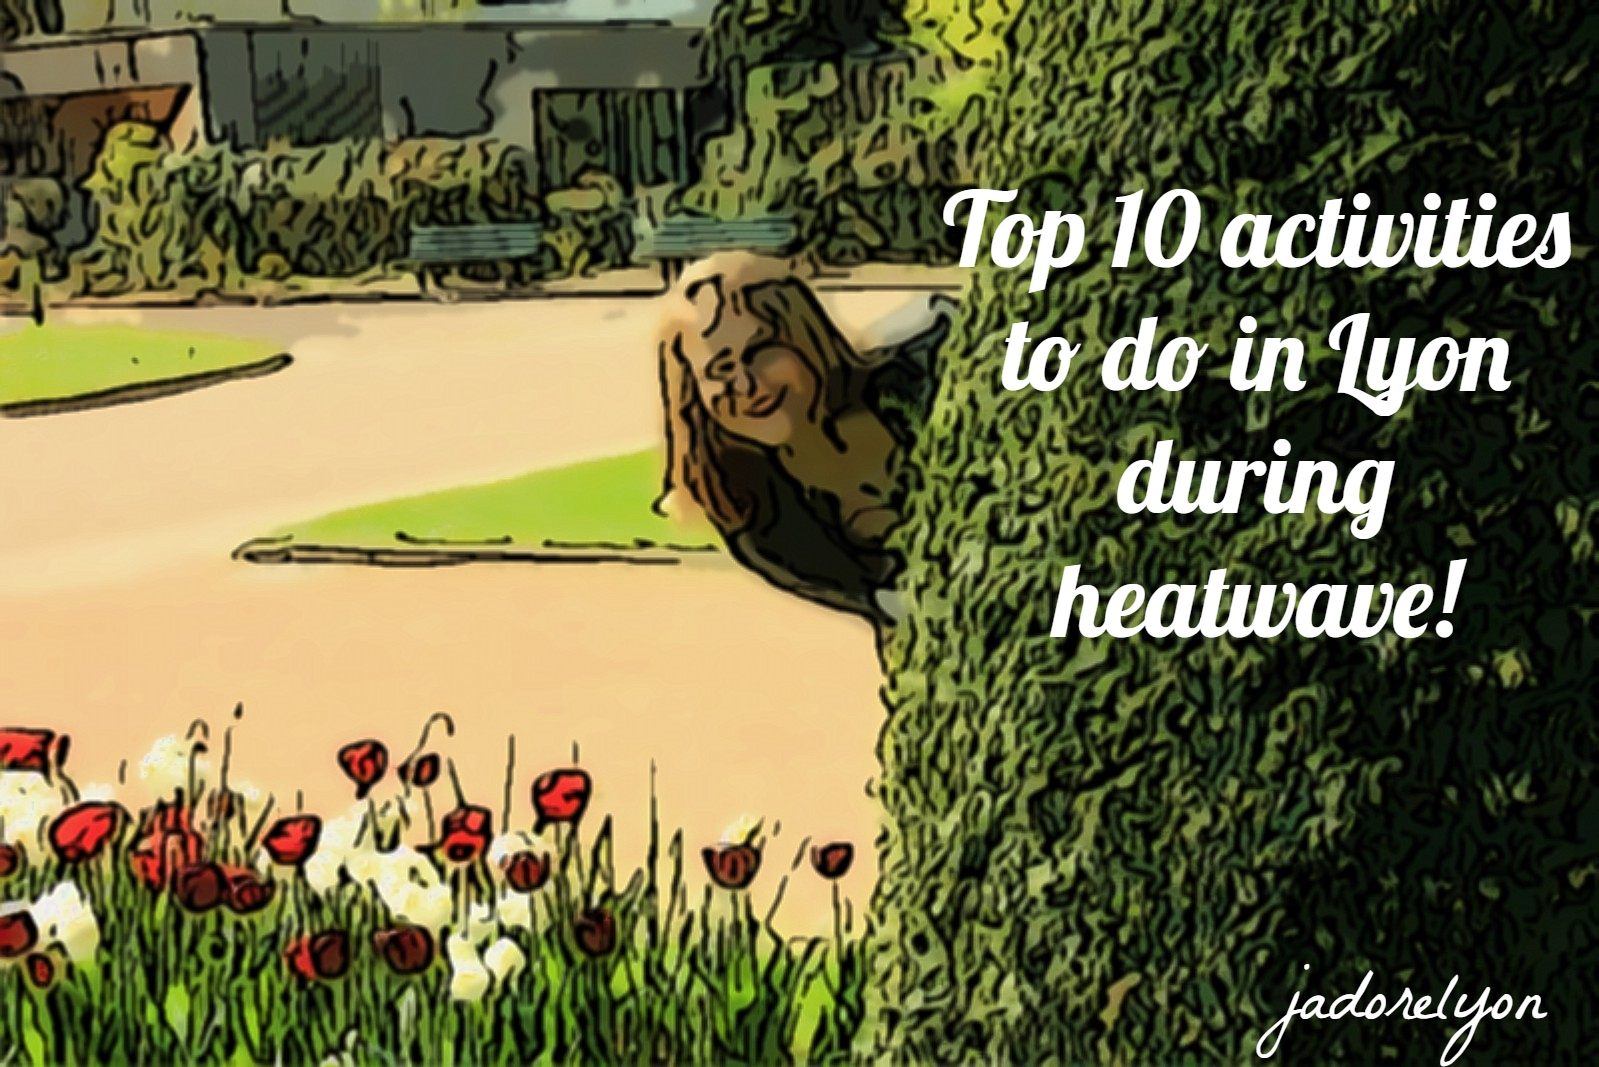 Top 10 activities to do in Lyon during heatwave! (1)